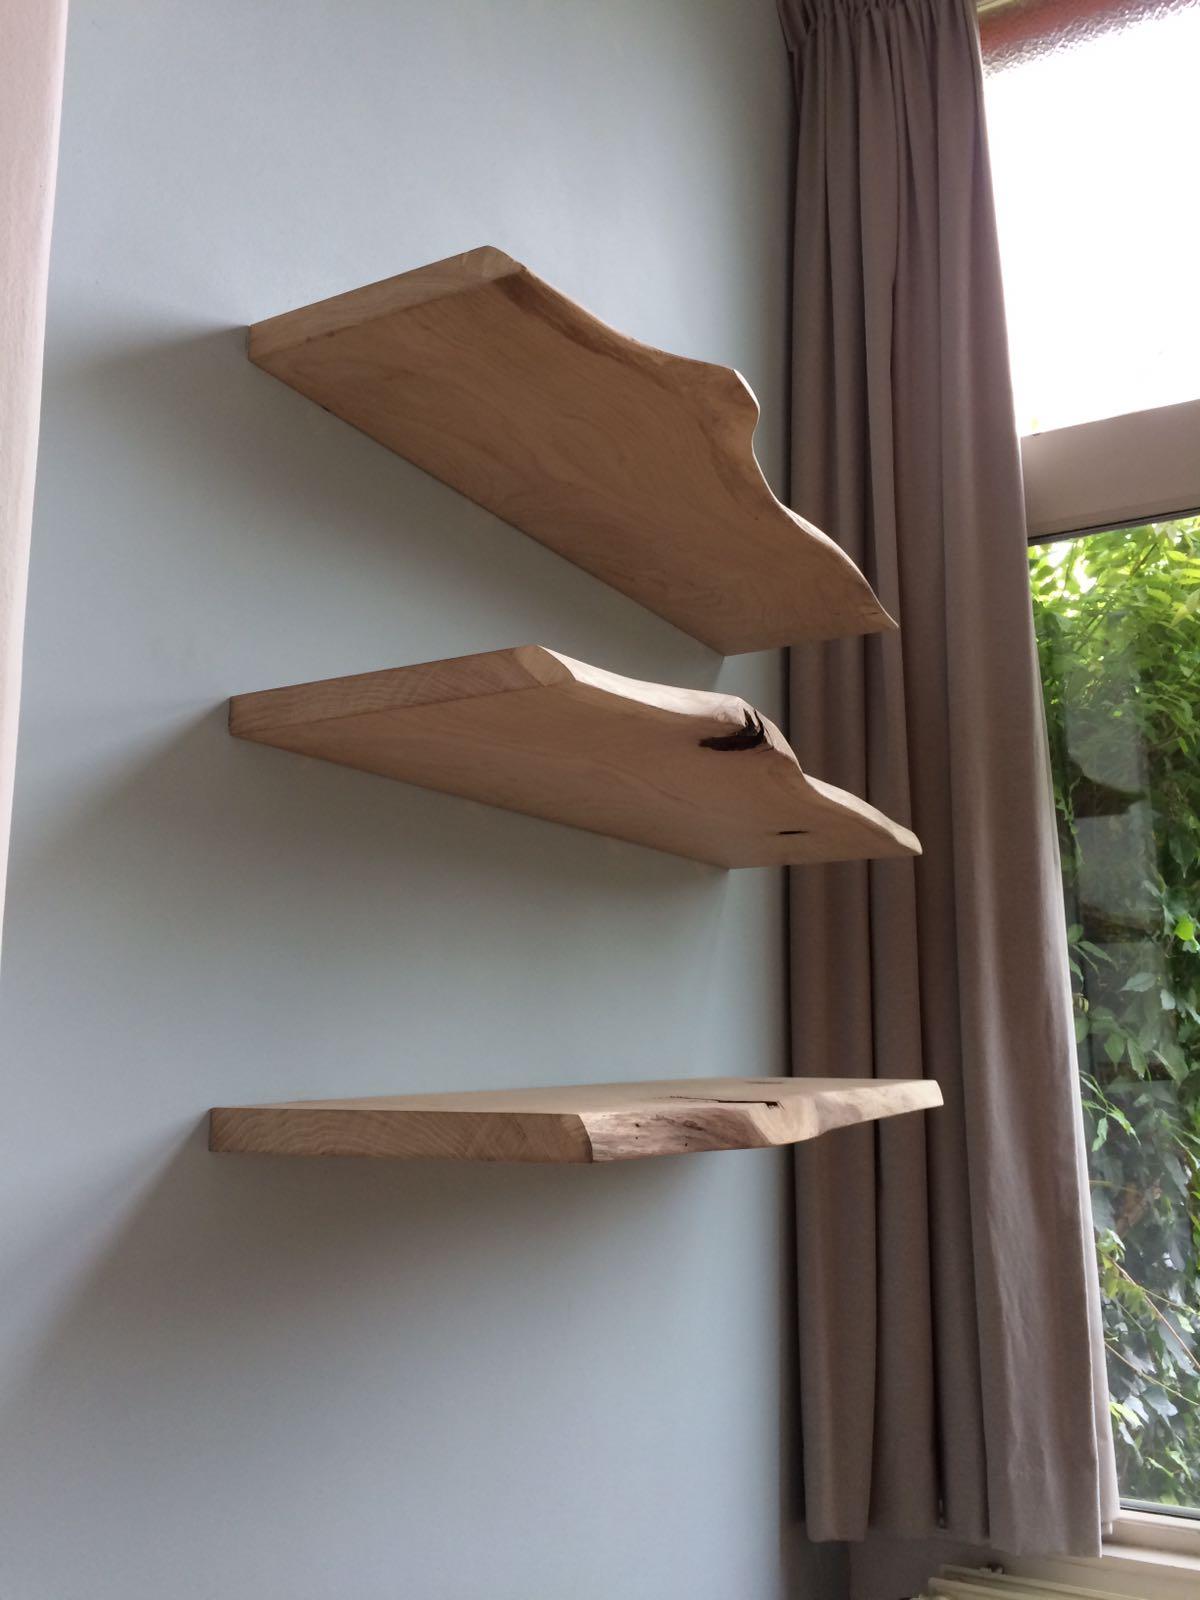 Umbra Conceal Zwevende Boekenplank.Boekenplank Flexa Classic Boekenplank With Boekenplank